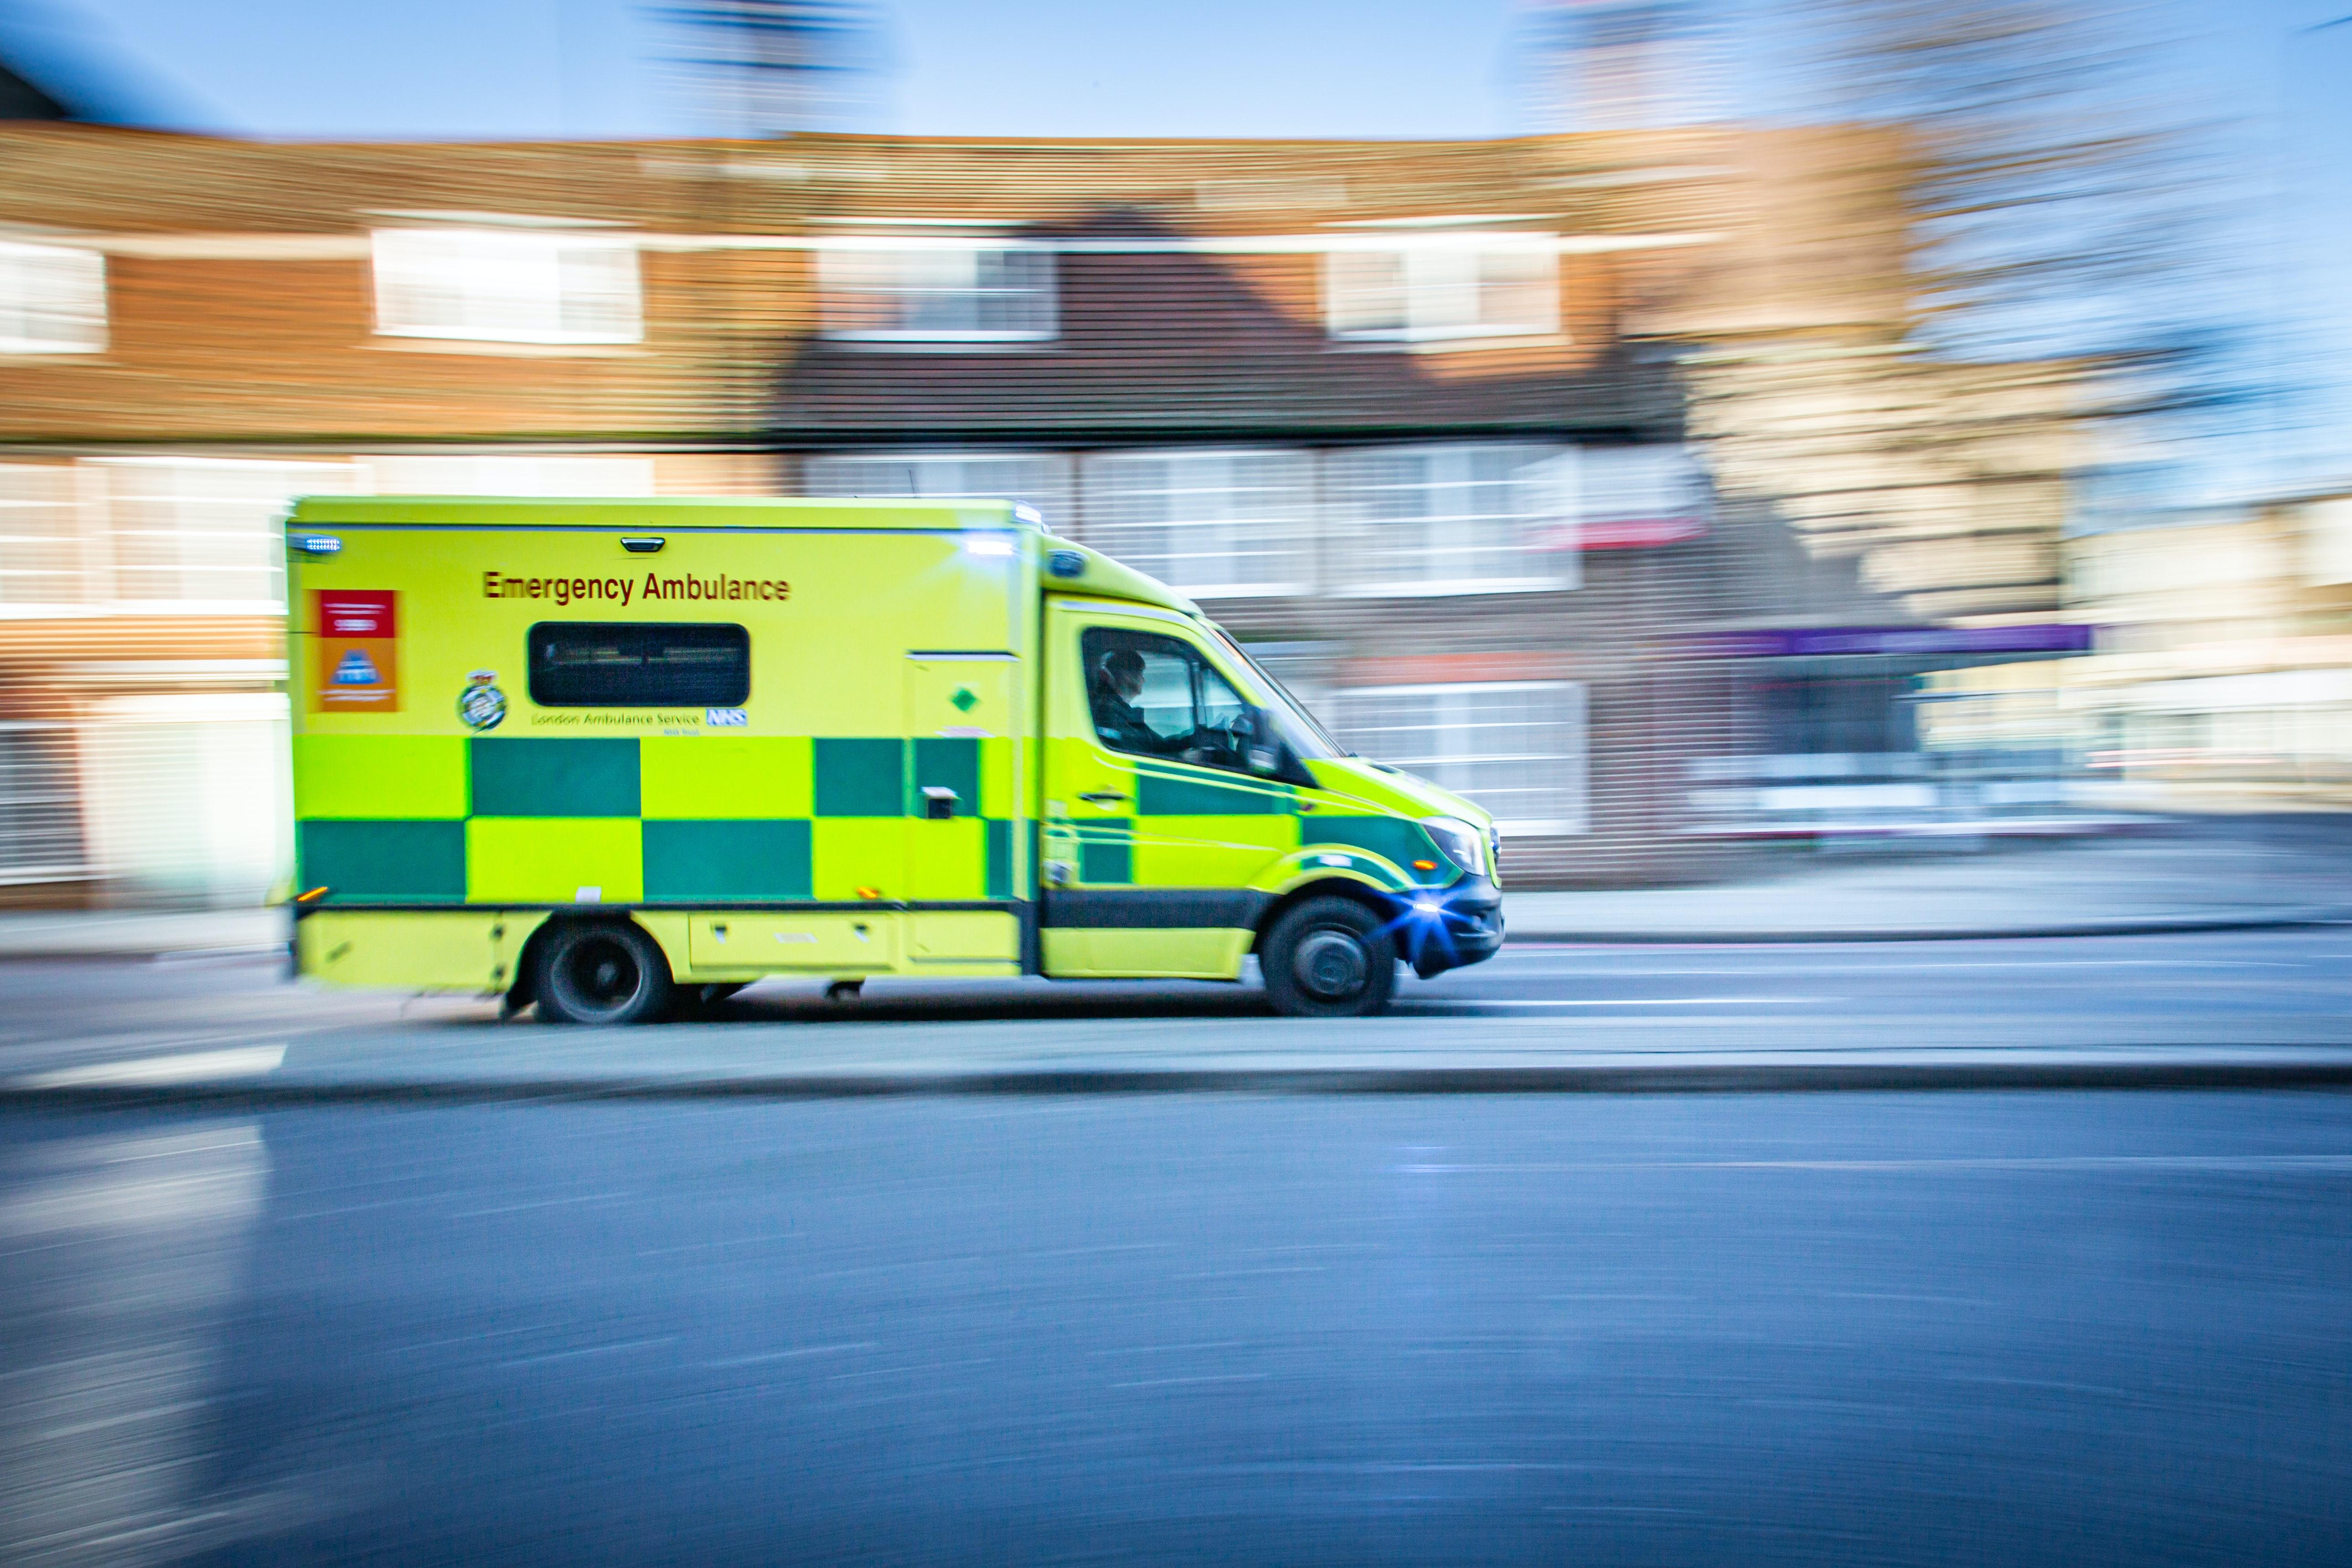 An NHS van responding to an emergency